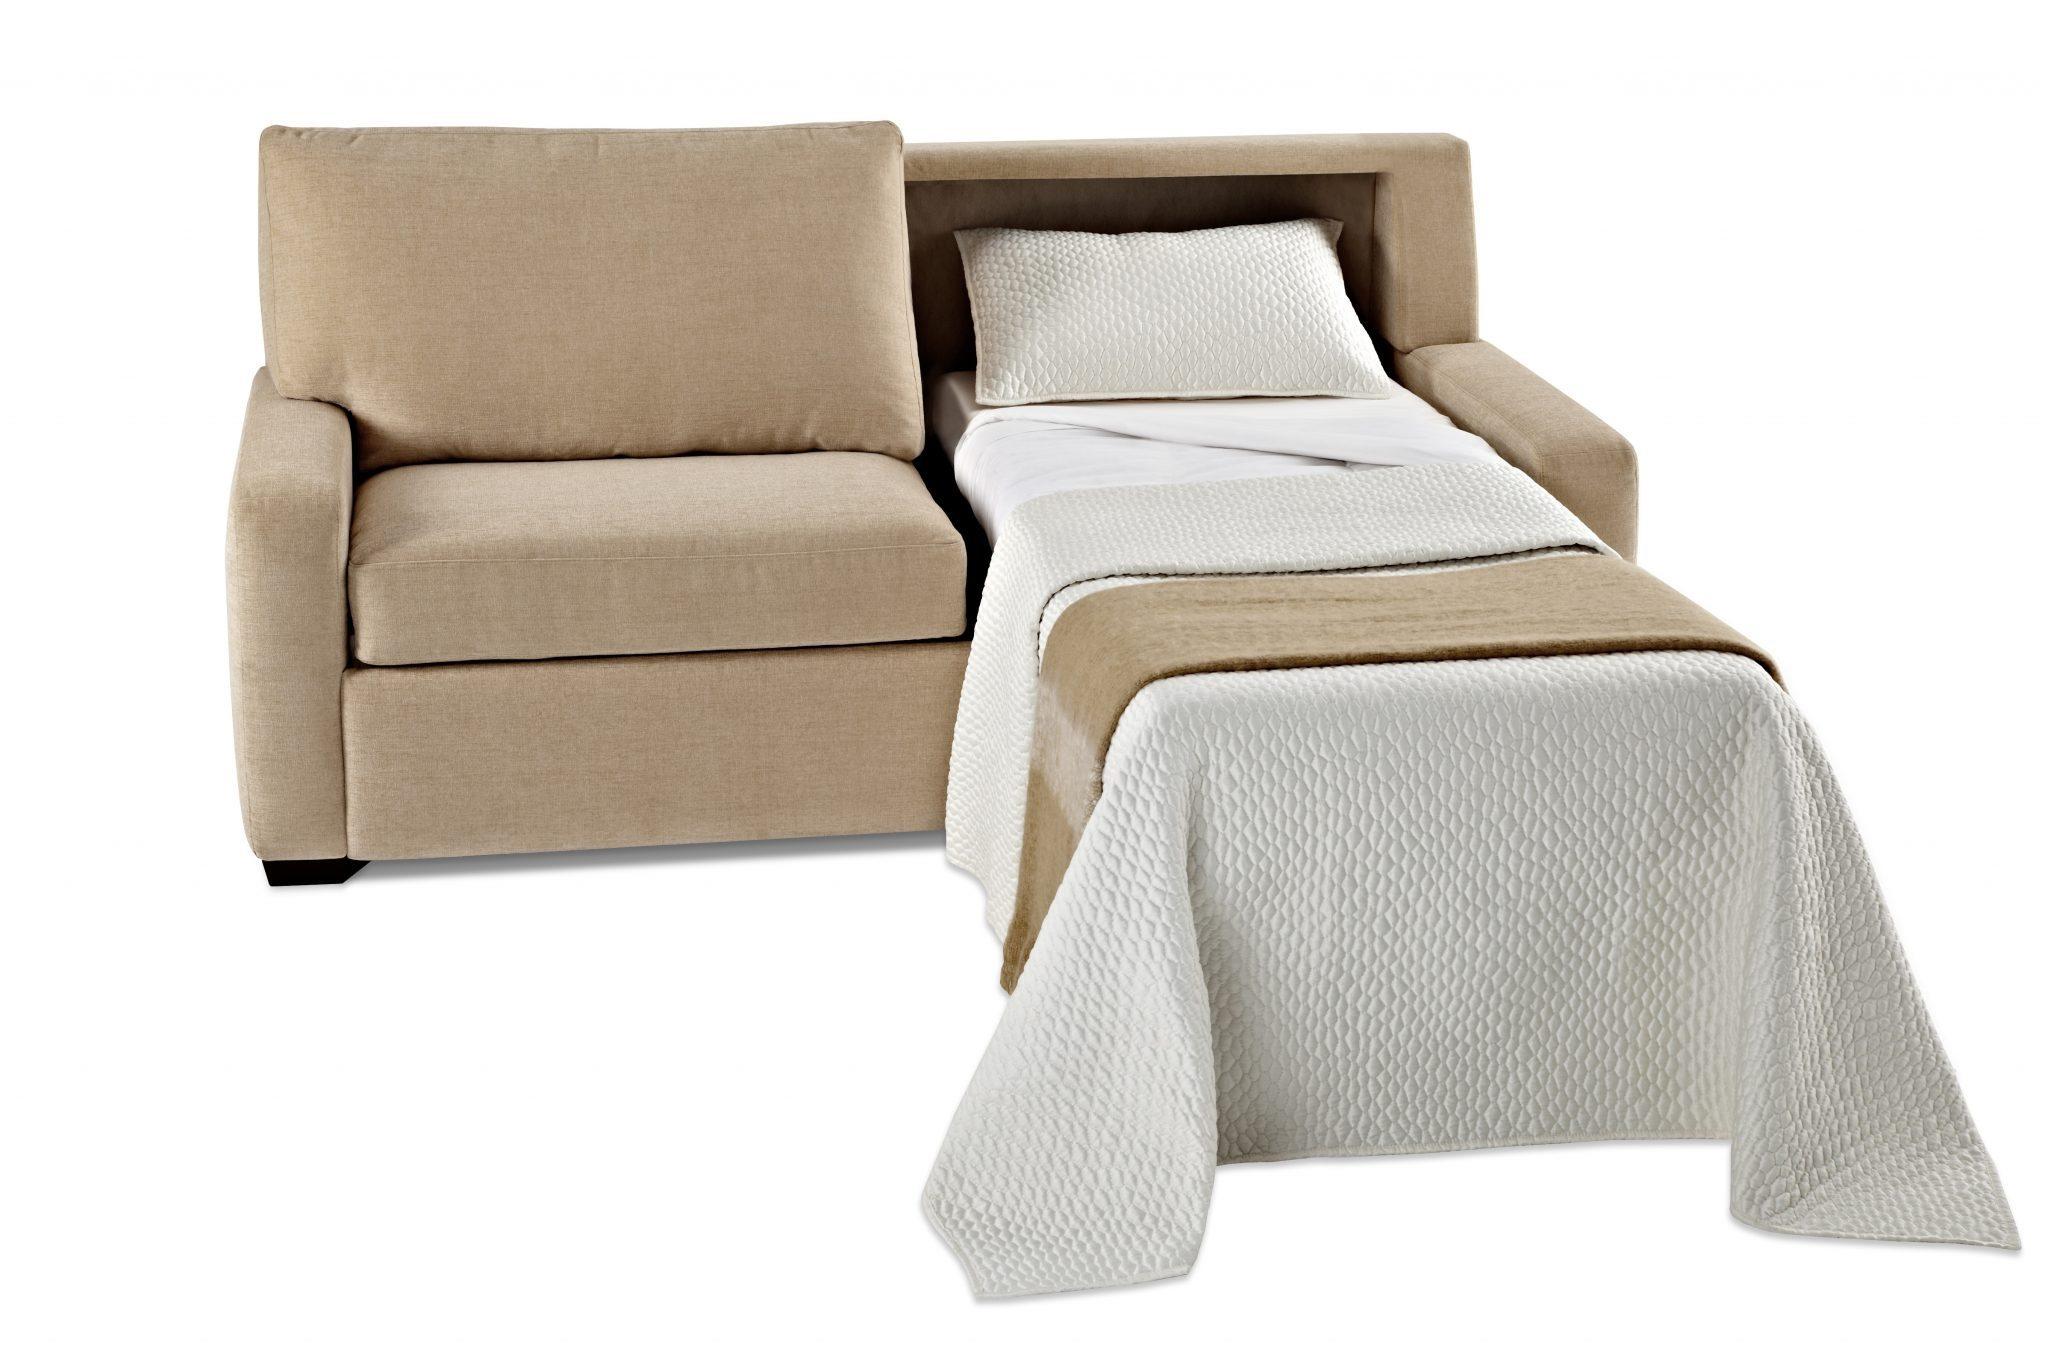 Sleeper Sofa Dimensions Hawk Haven